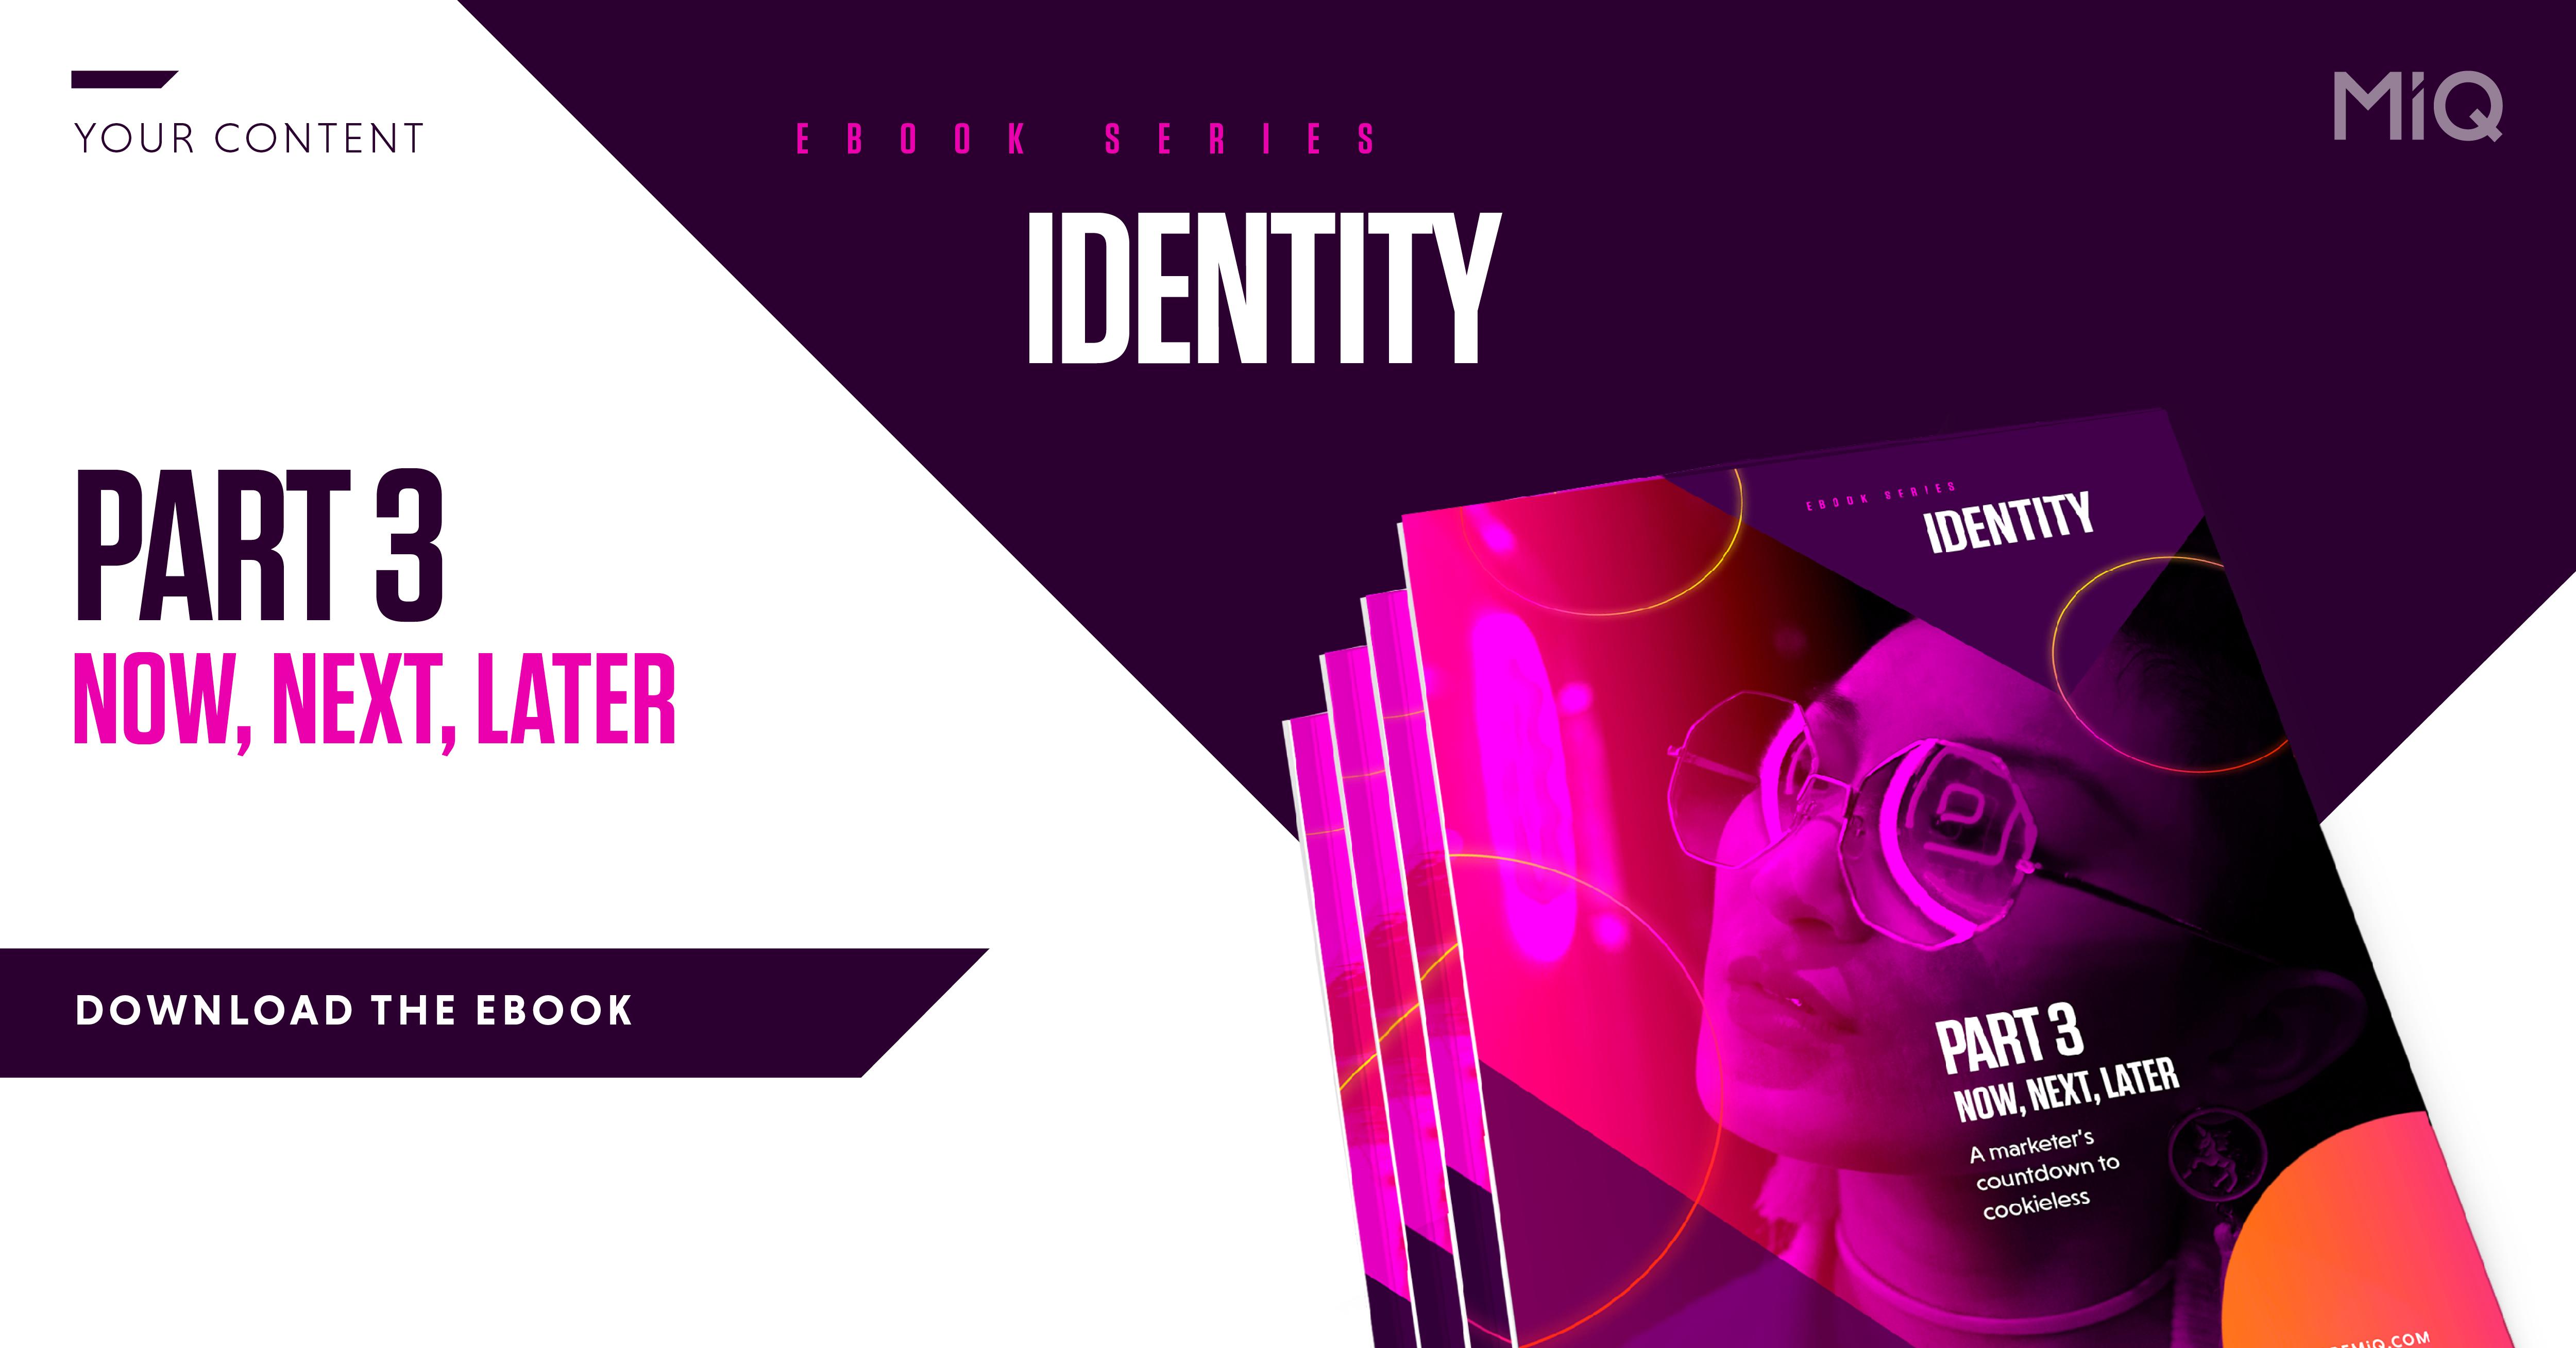 LinkedIn_ebook_identity_#3 11.15.15 AM